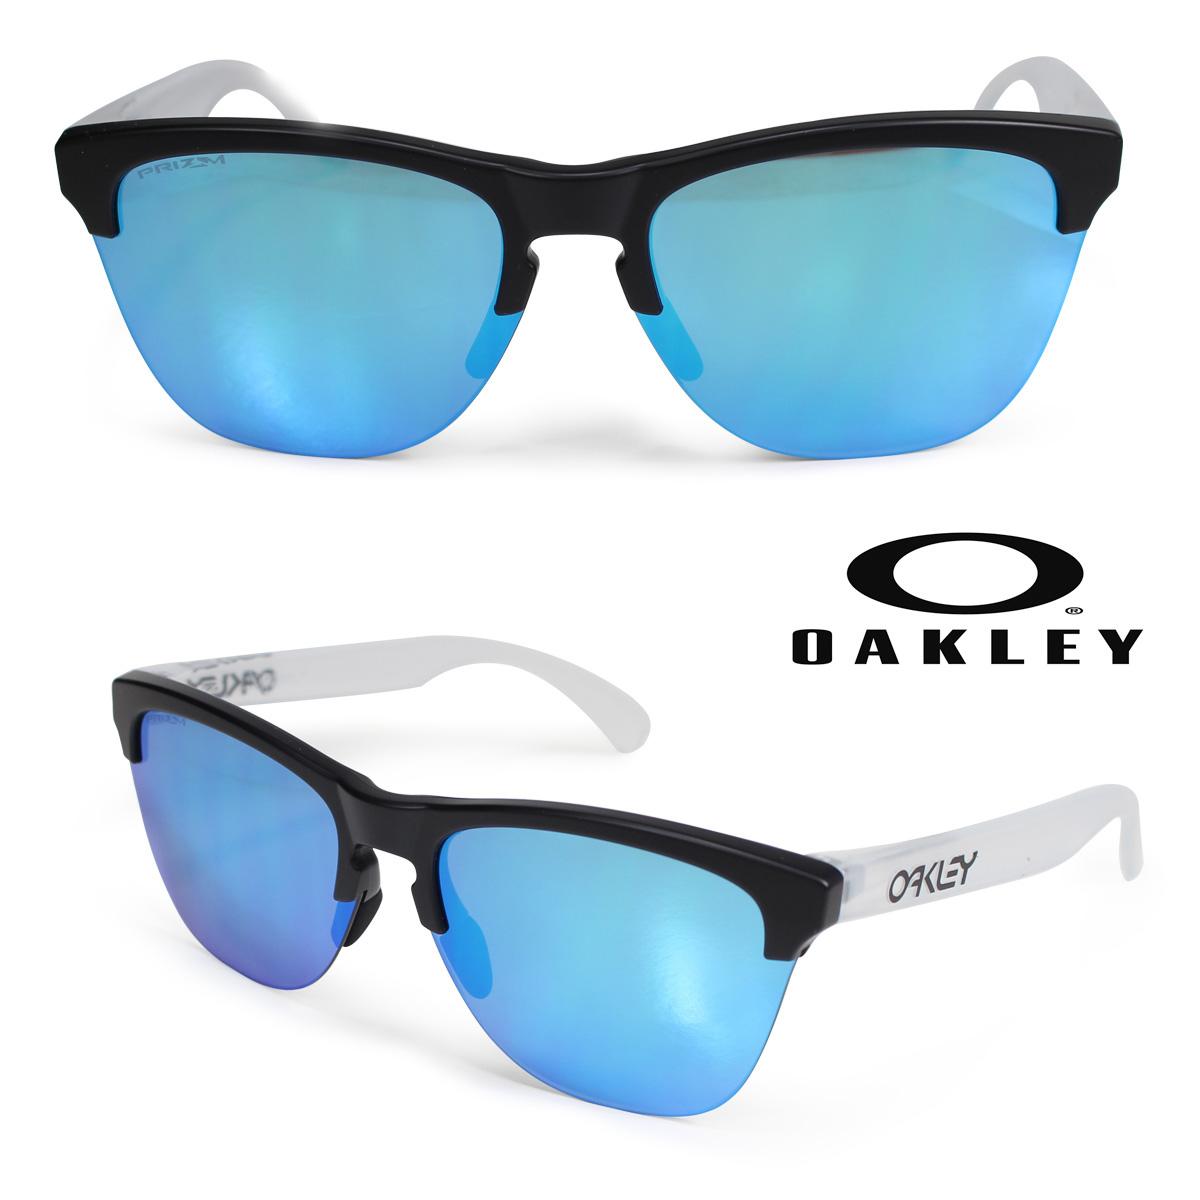 Oakley サングラス オークリー Frogskins lite フロッグスキン ライト US FIT メンズ レディース ブラック OO9374-02